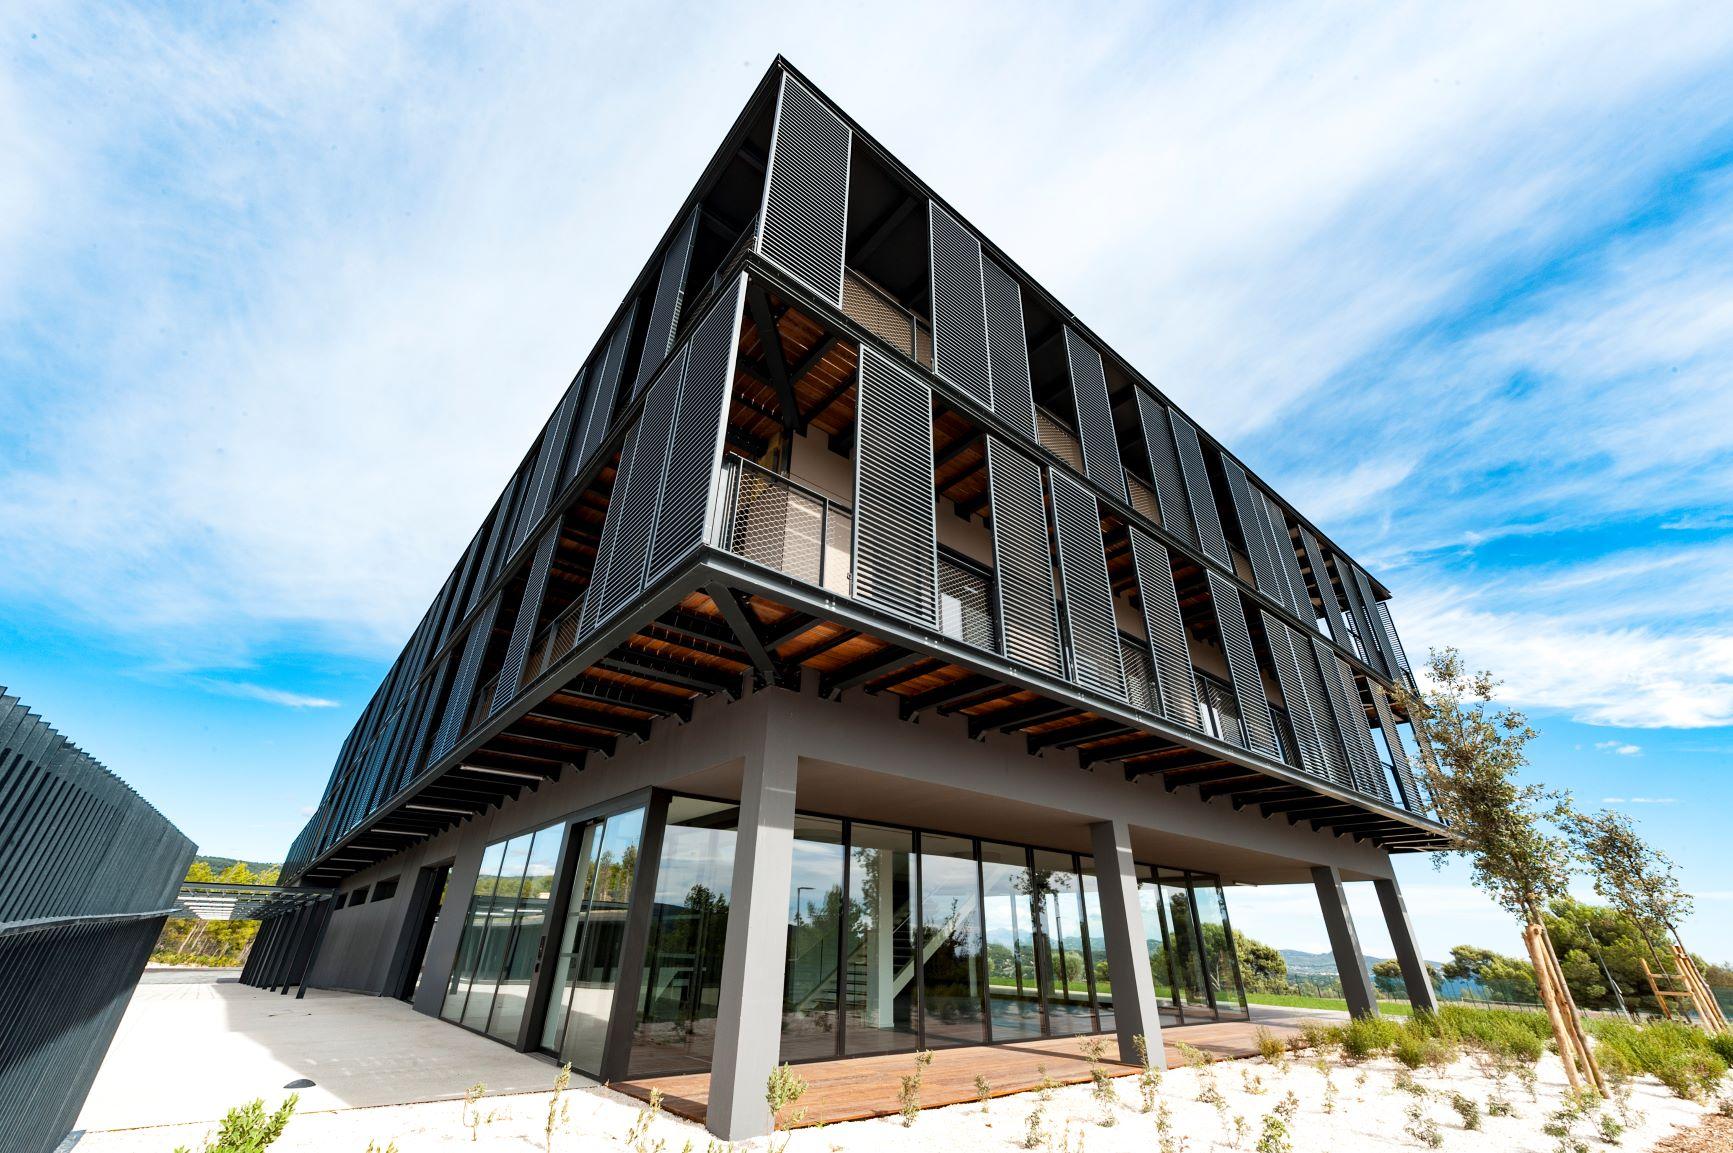 LDTVO La Ciotat building